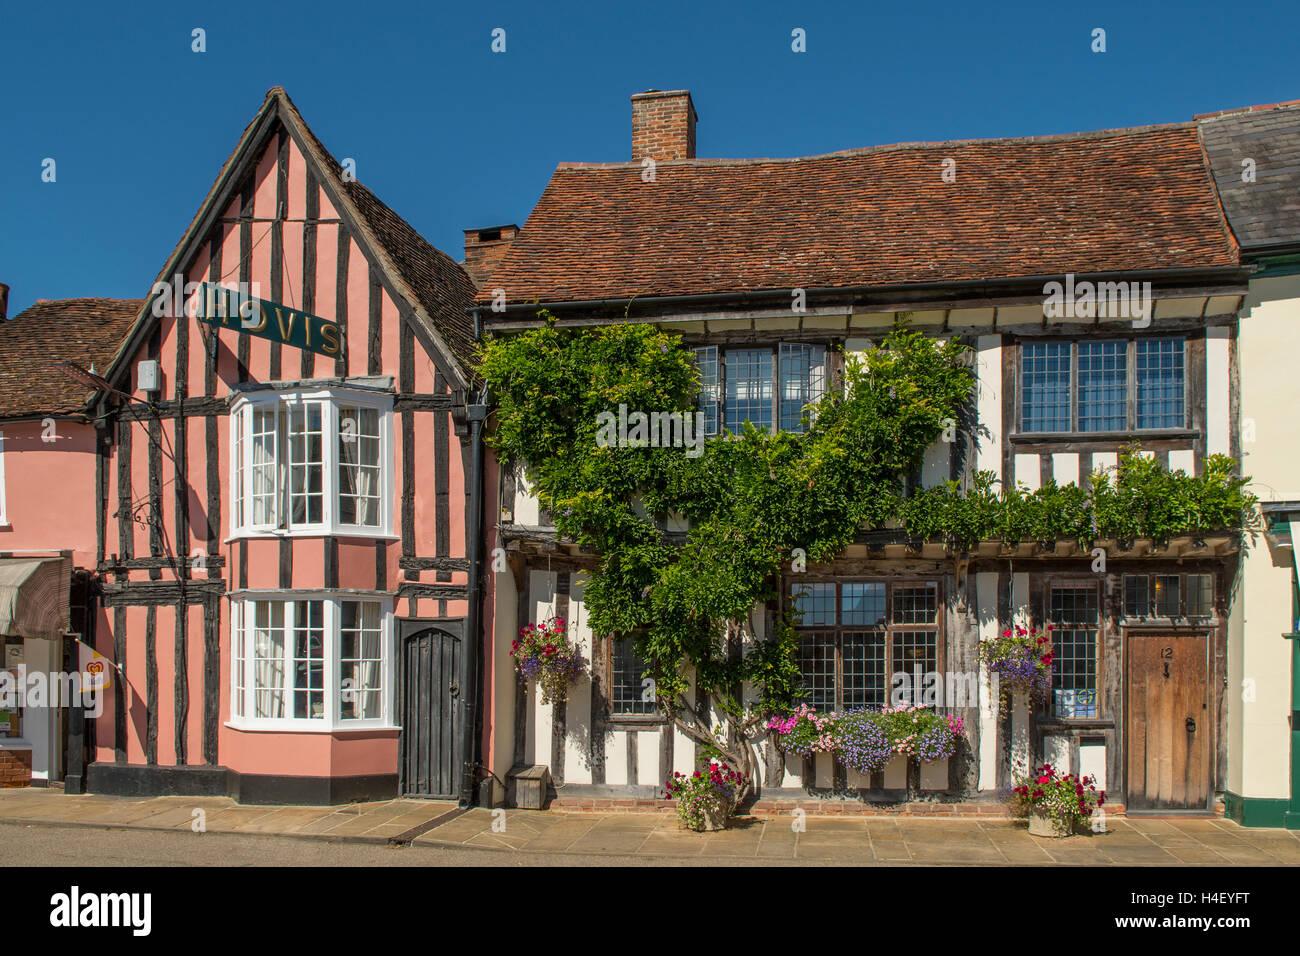 Tudor Buildings, Lavenham, Suffolk, England - Stock Image